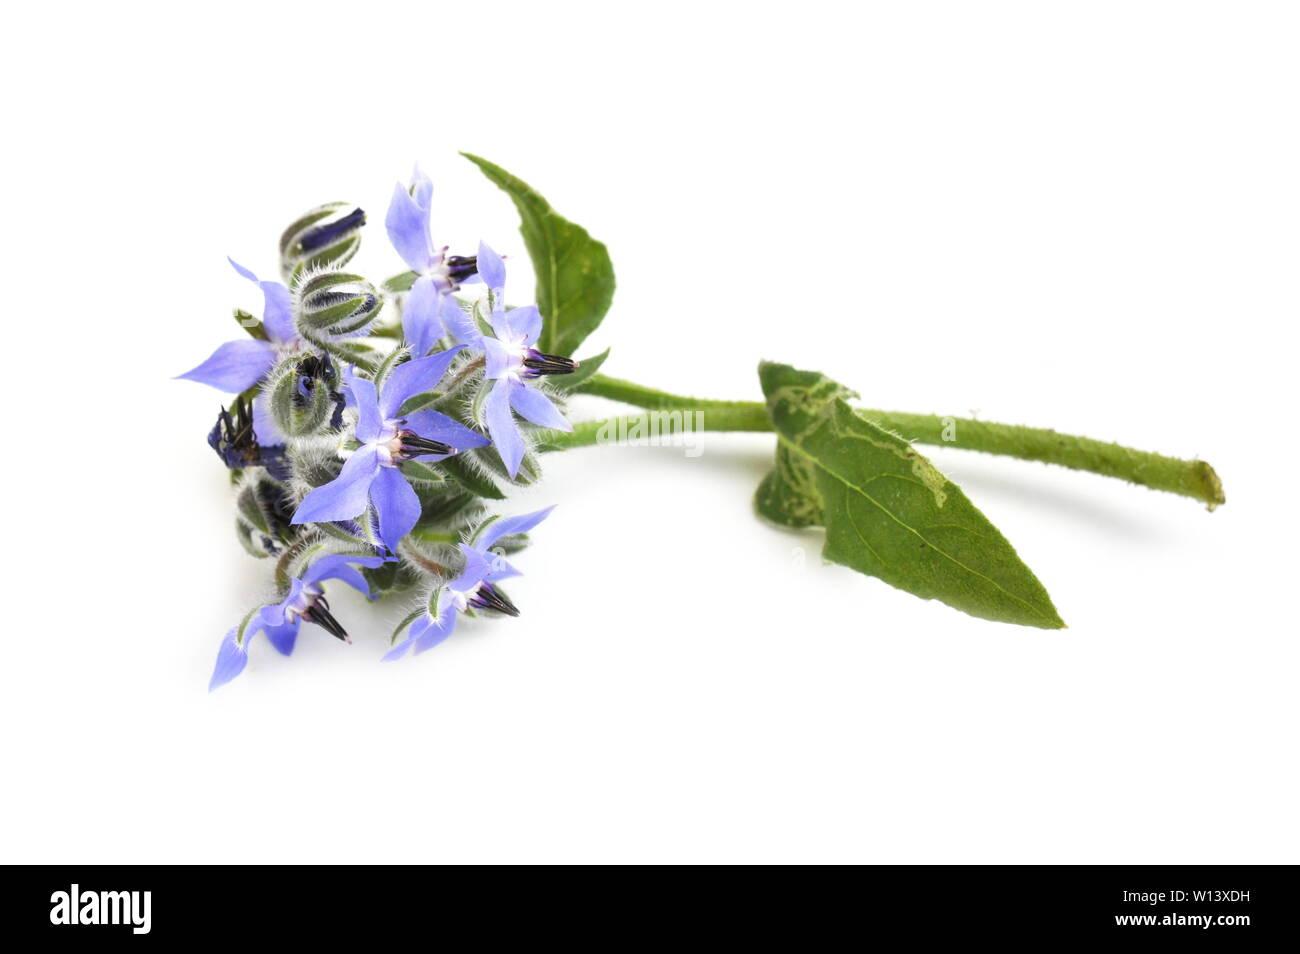 Starflower Borago officinalis on white background - Stock Image